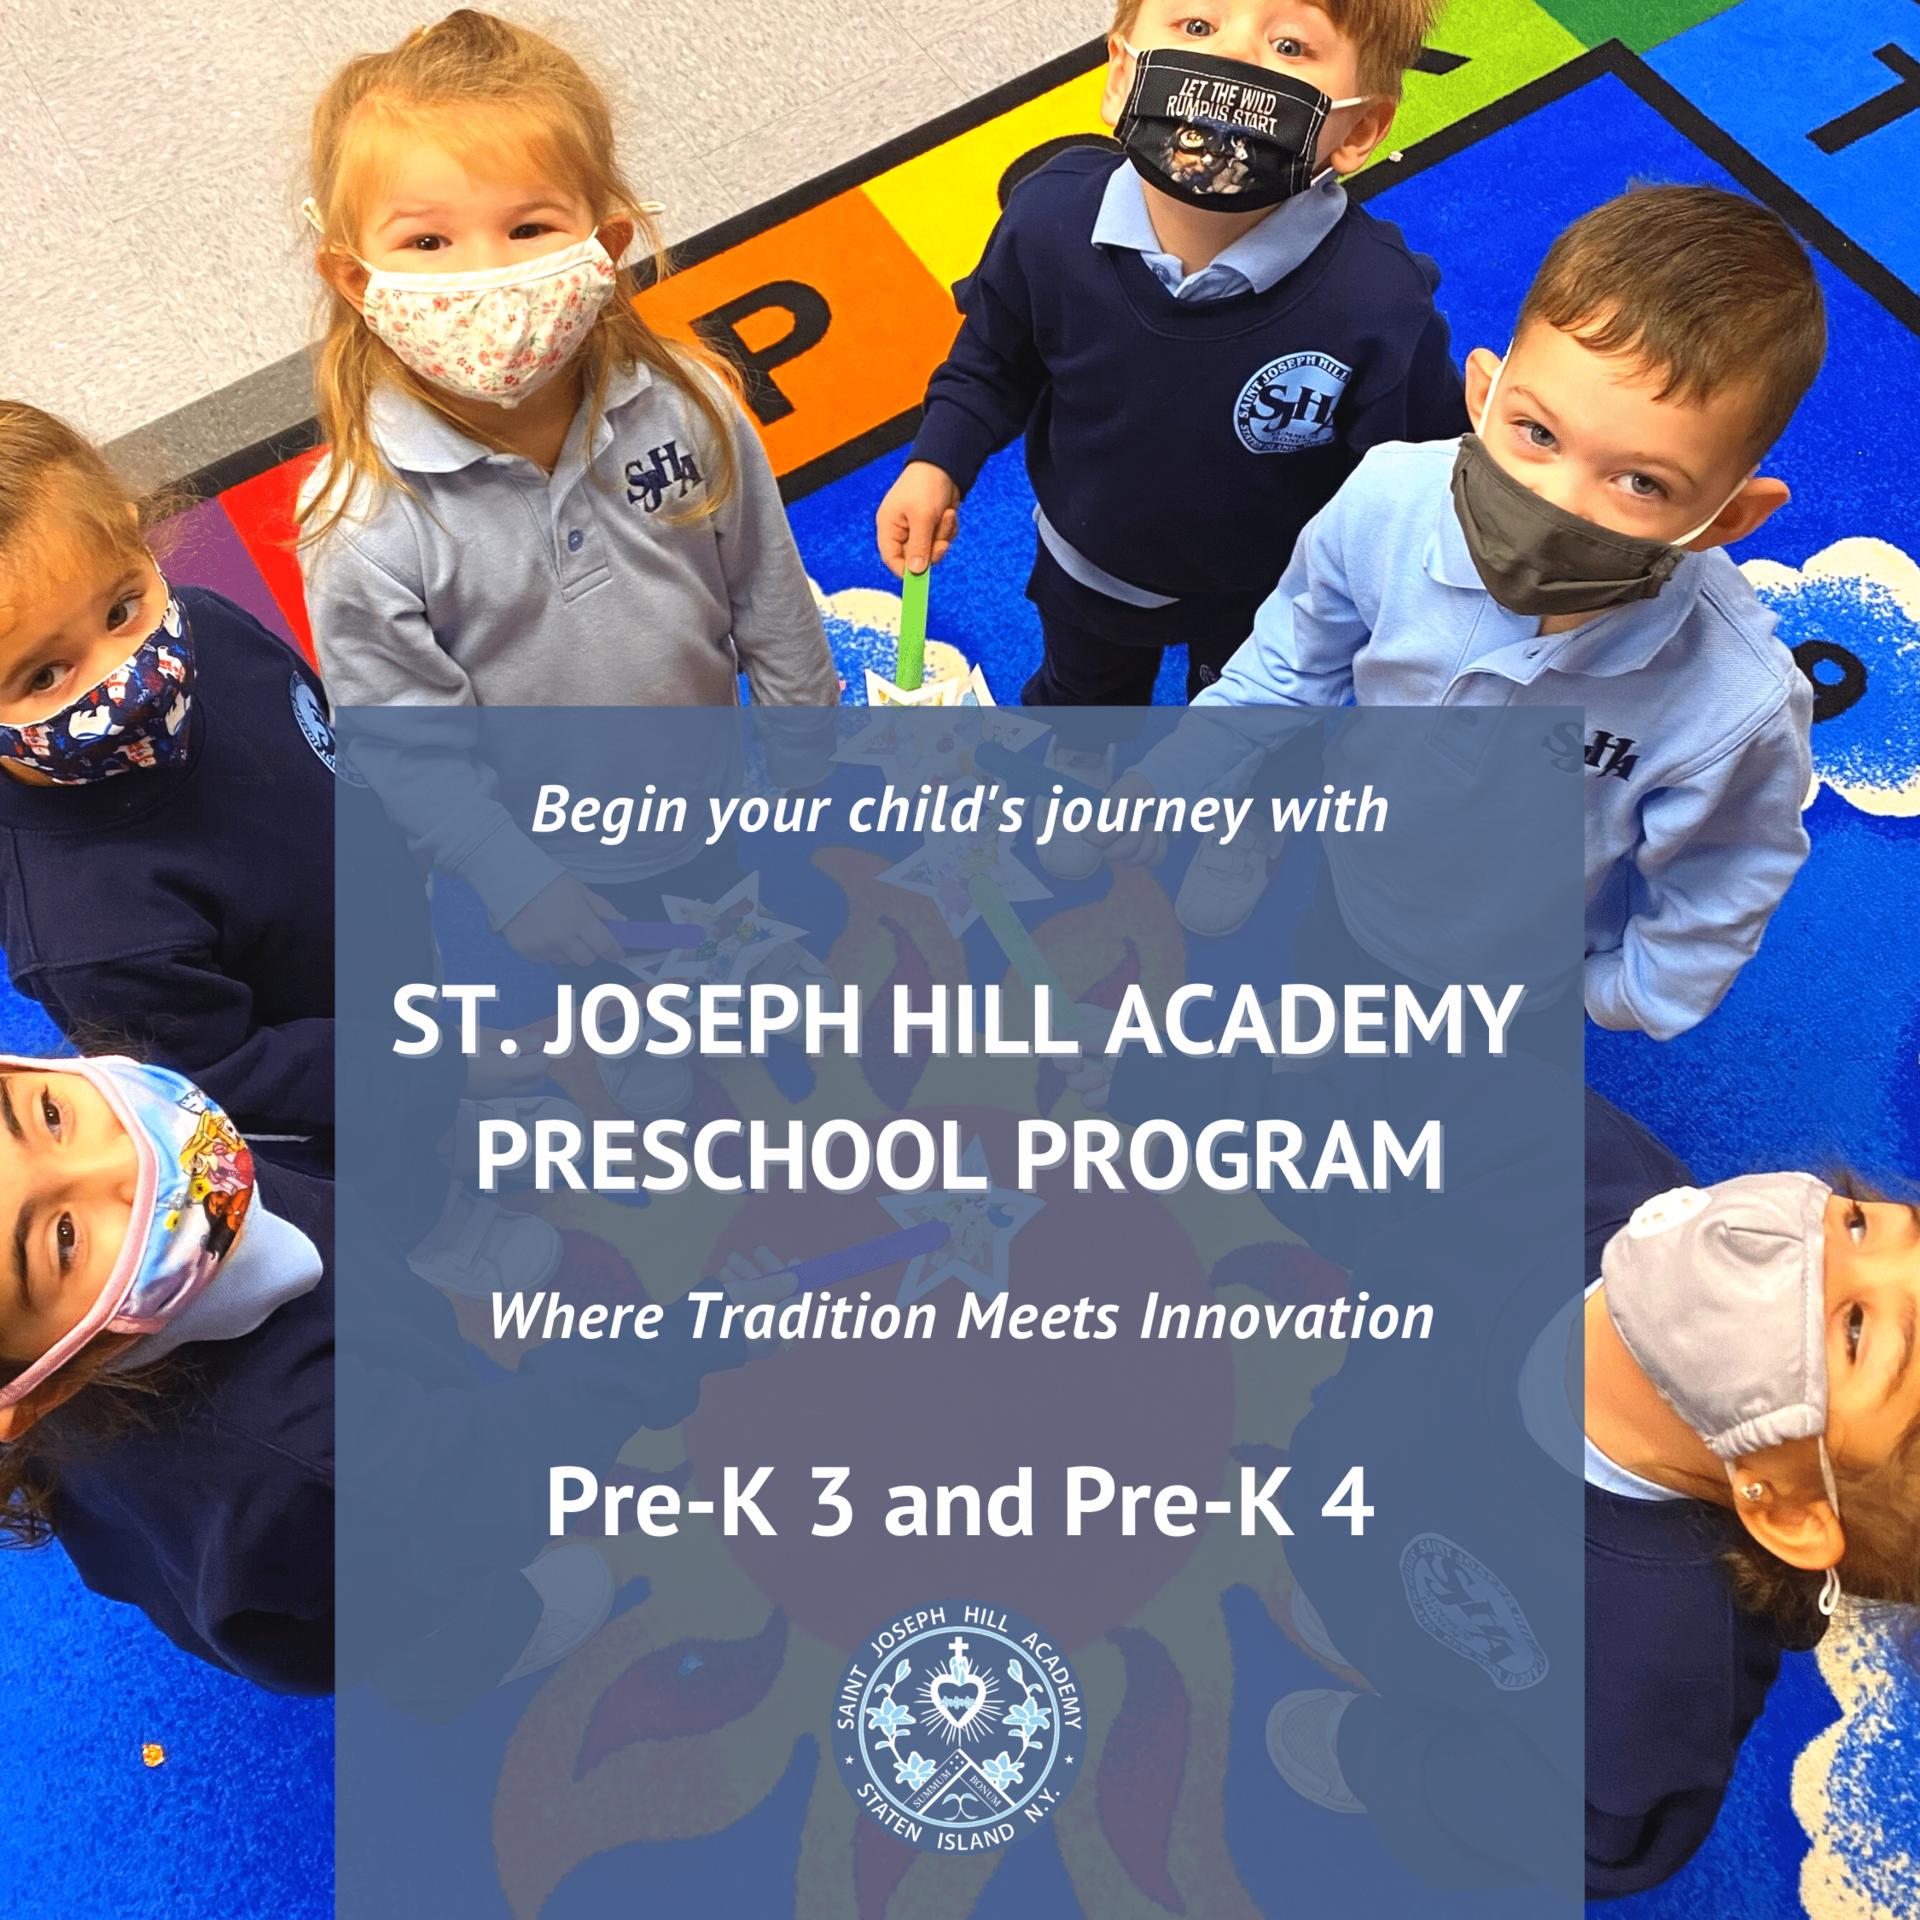 Preschool Program Where Tradition Meets Innovation